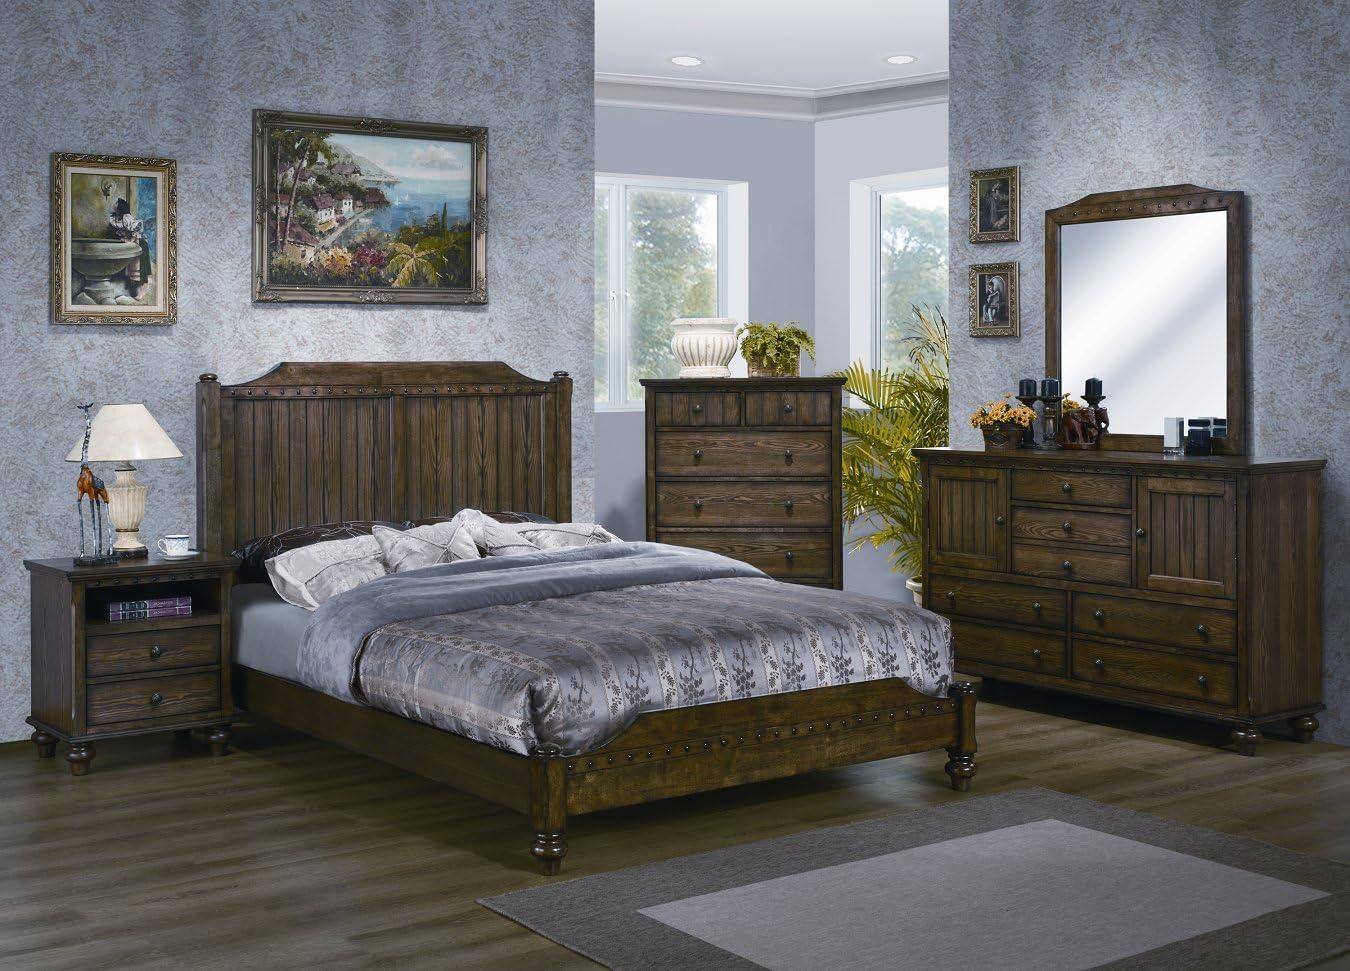 Yuan Tai Dartmouth 5-Piece Bedroom Furniture Set, King